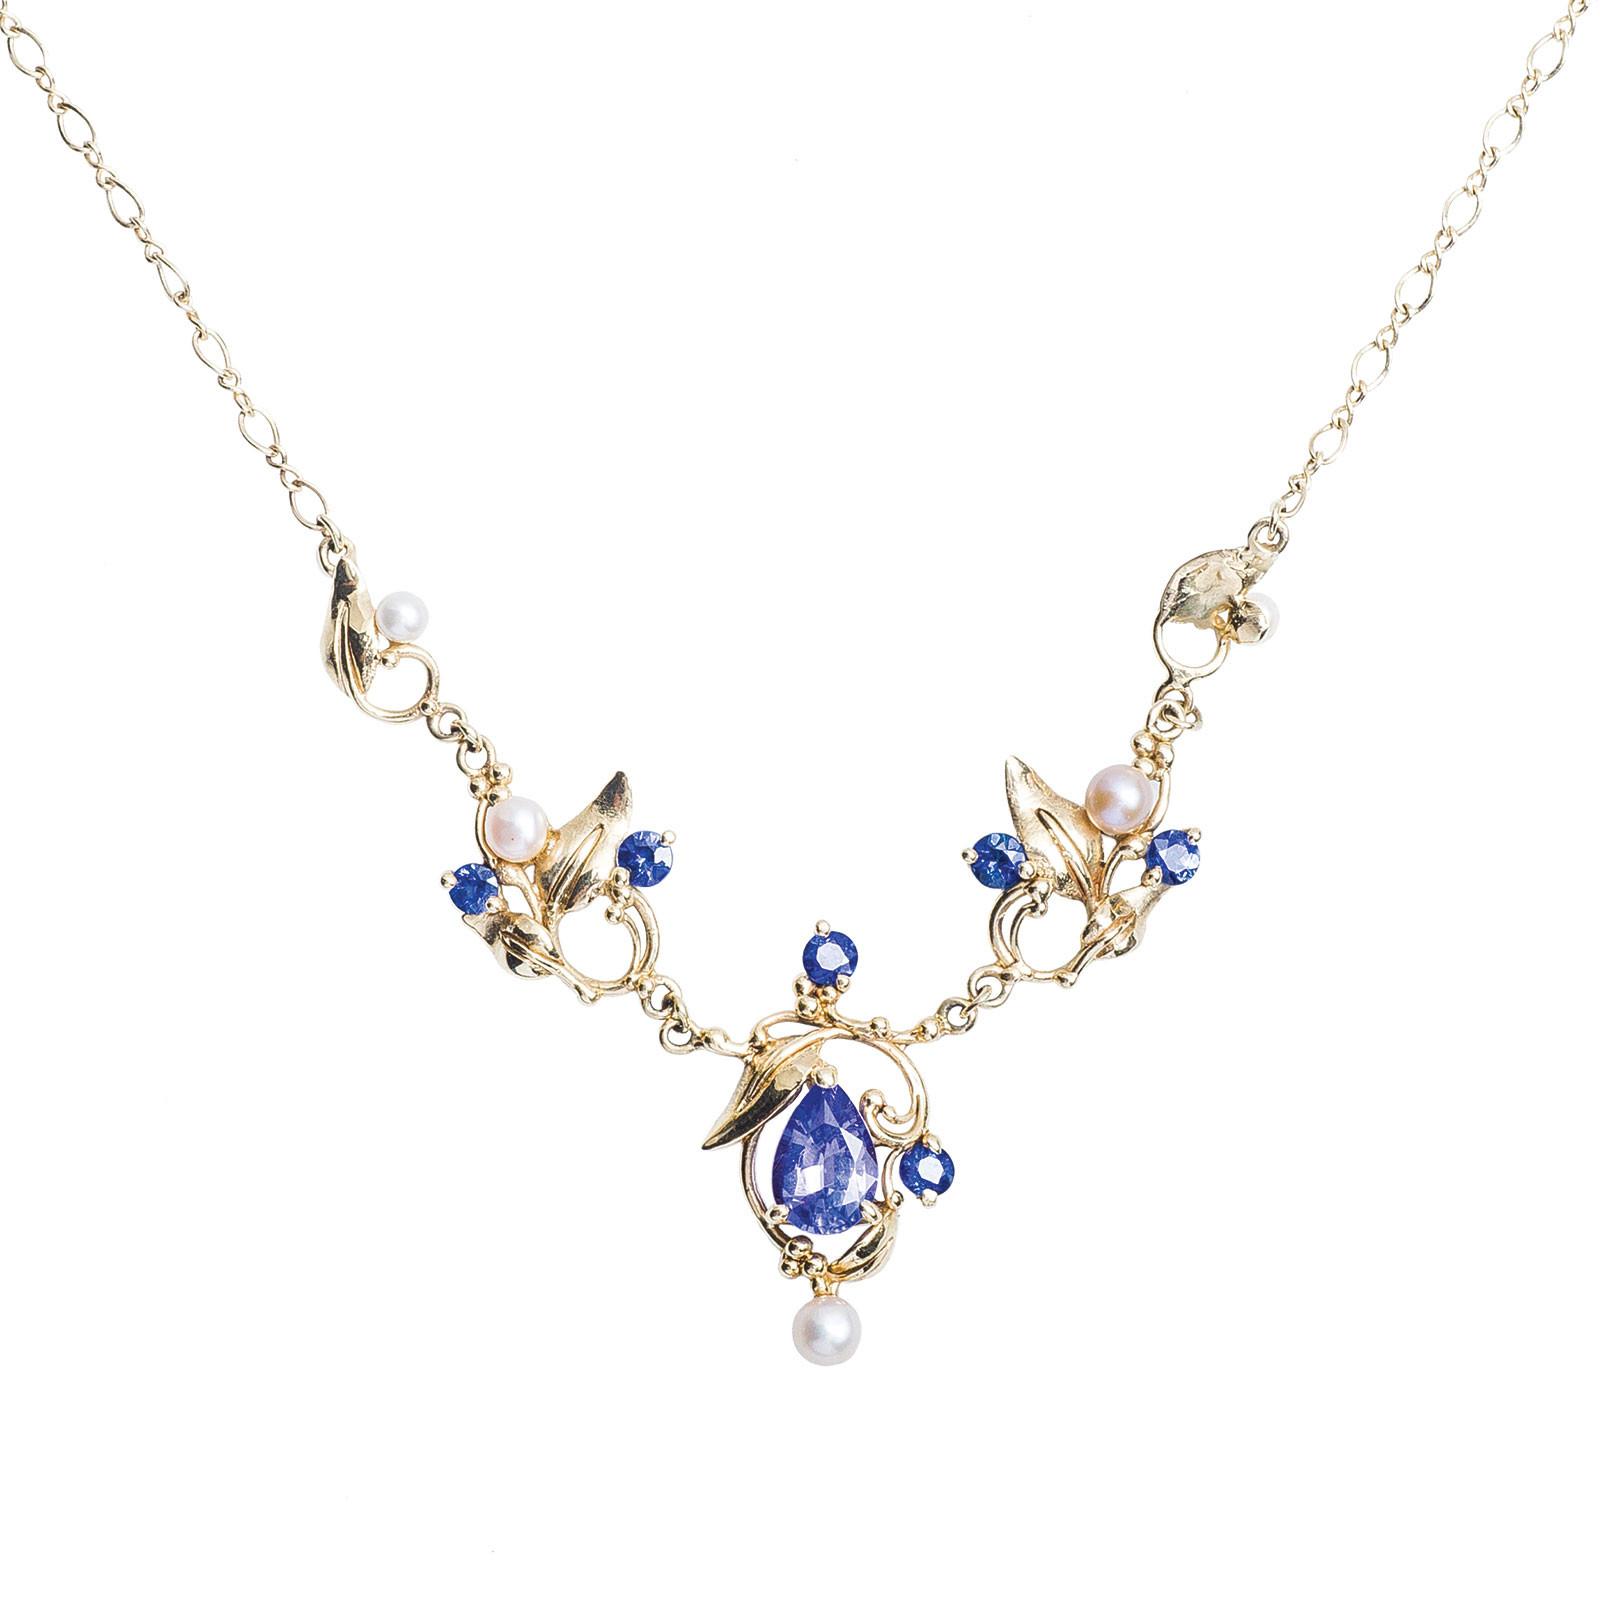 Vintage 1.72 CTW Tanzanite, Sapphire & Pearl Necklace